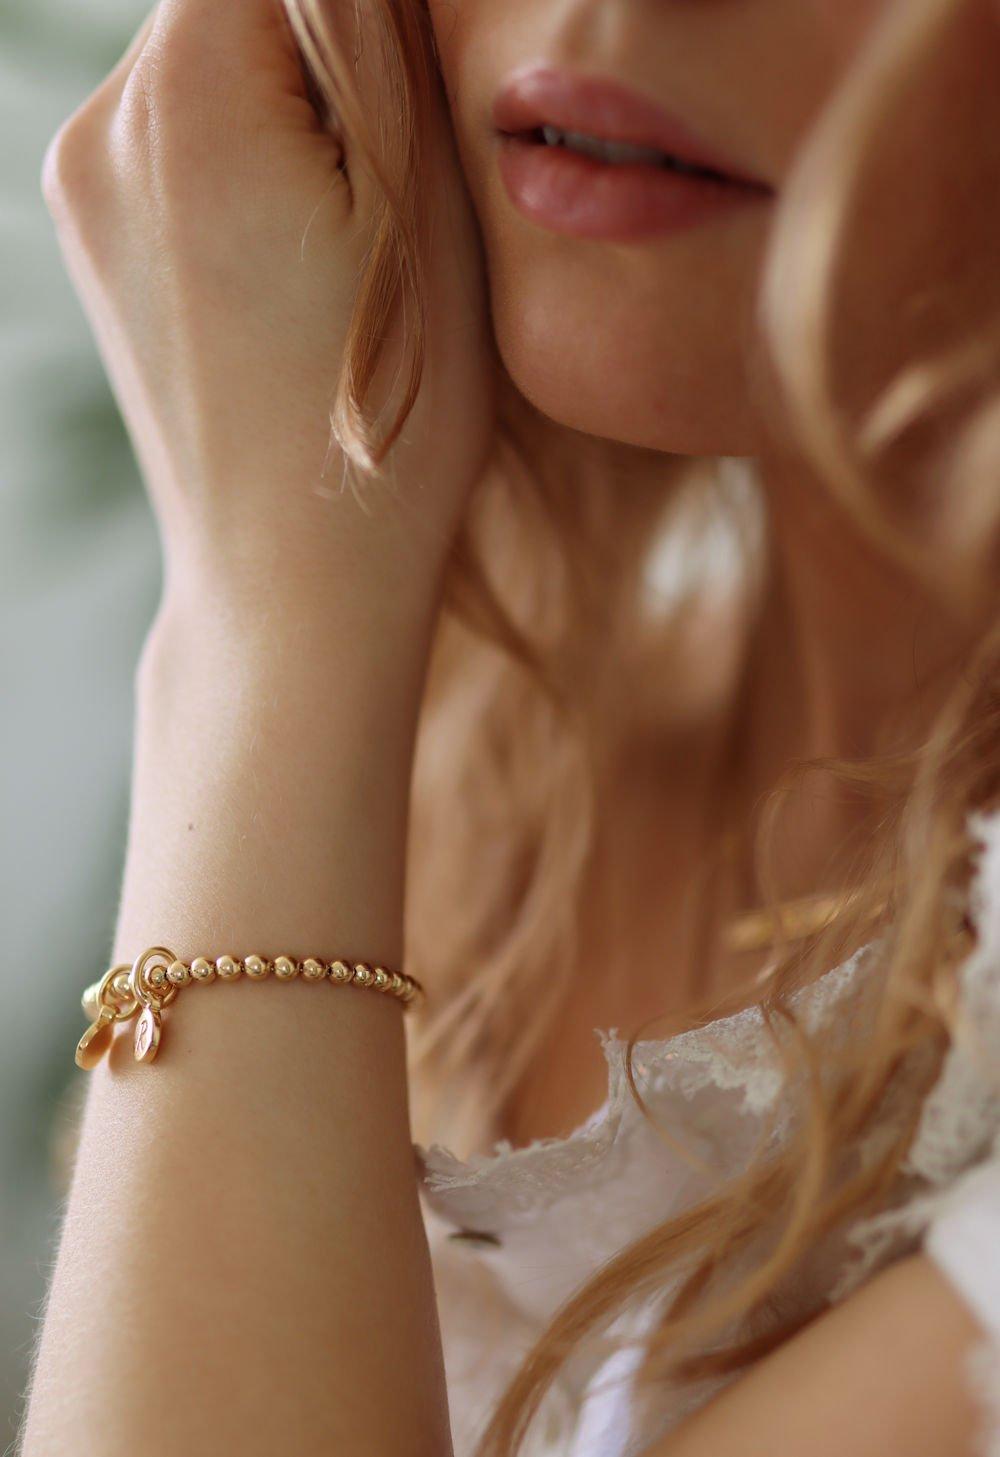 rellery bracelet personalized